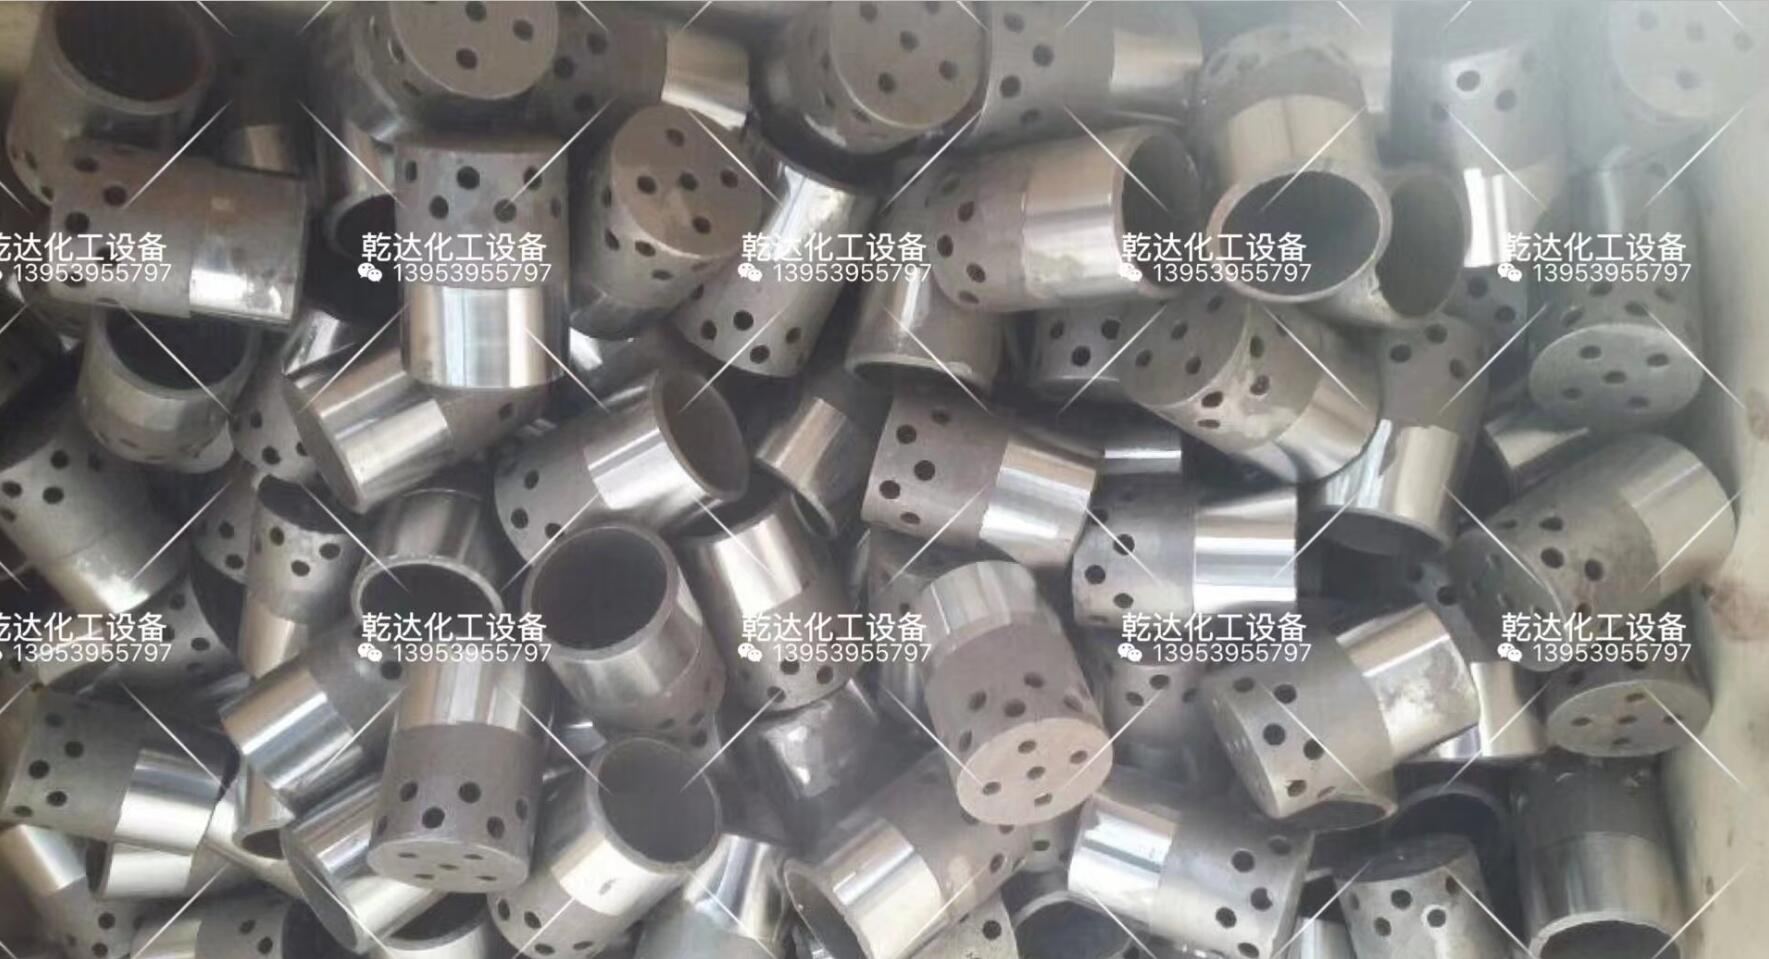 qian达hua工设bei提供好的沸腾炉风帽-港口沸腾炉风帽专业供应